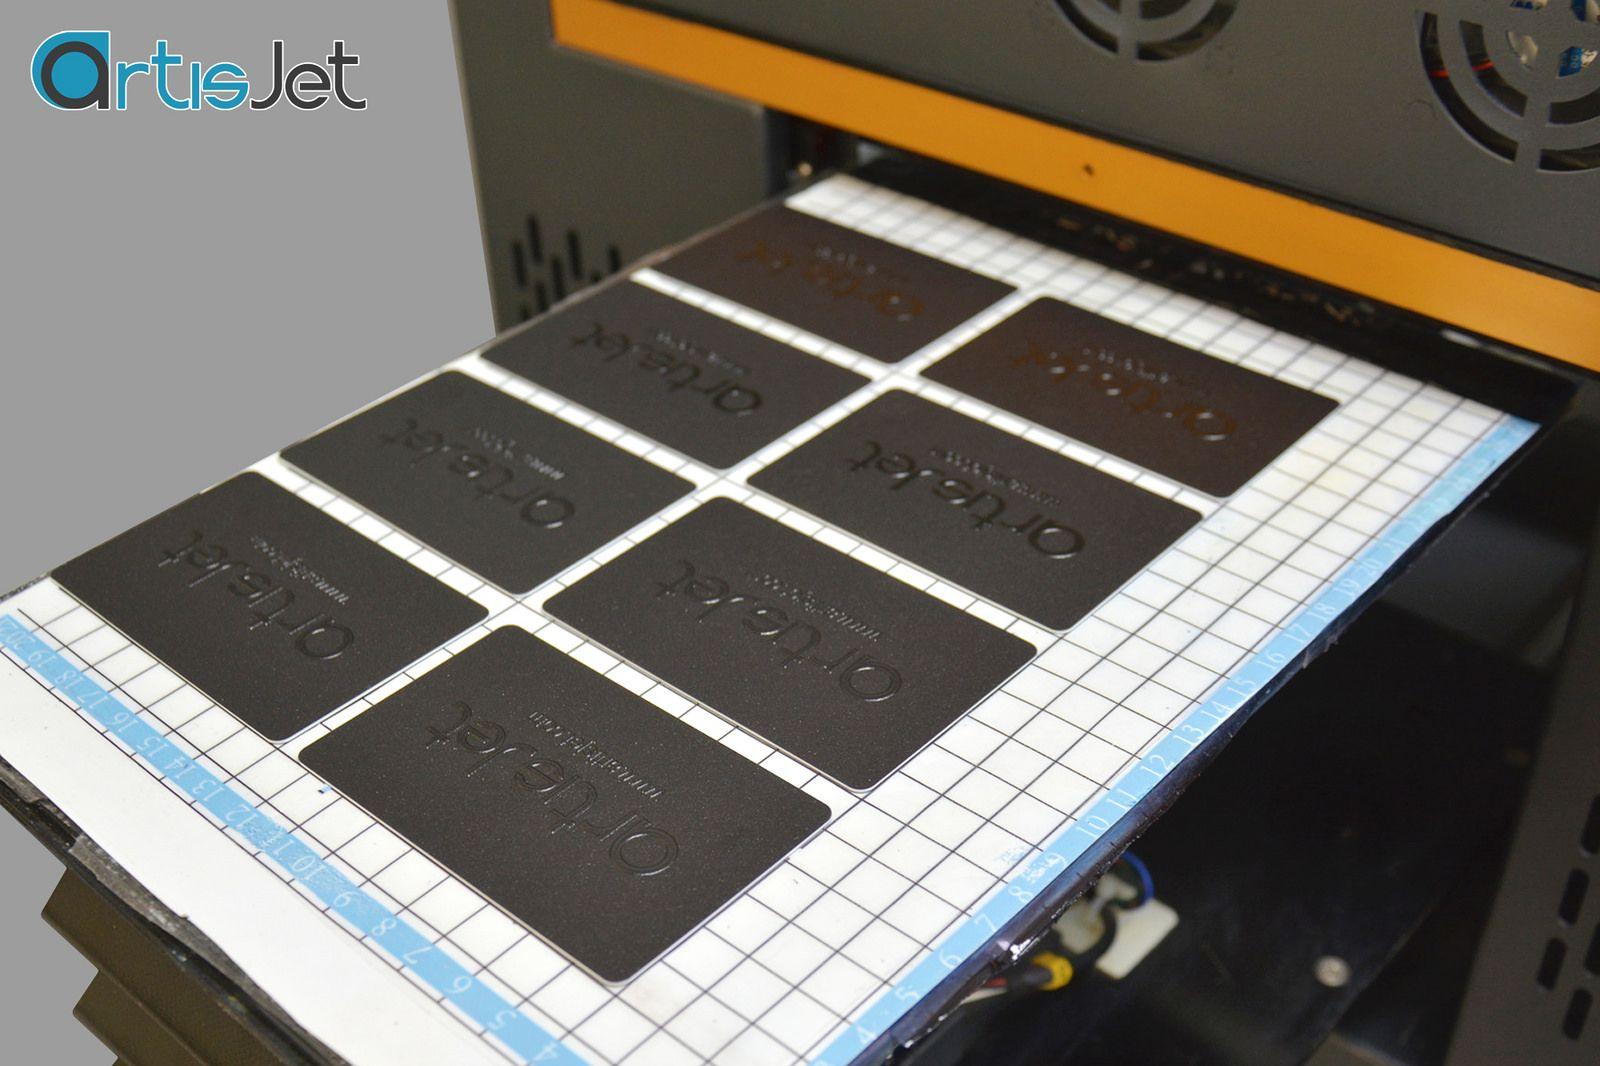 Varnish printing with artis 2100U printer | Varnishes, High class ...